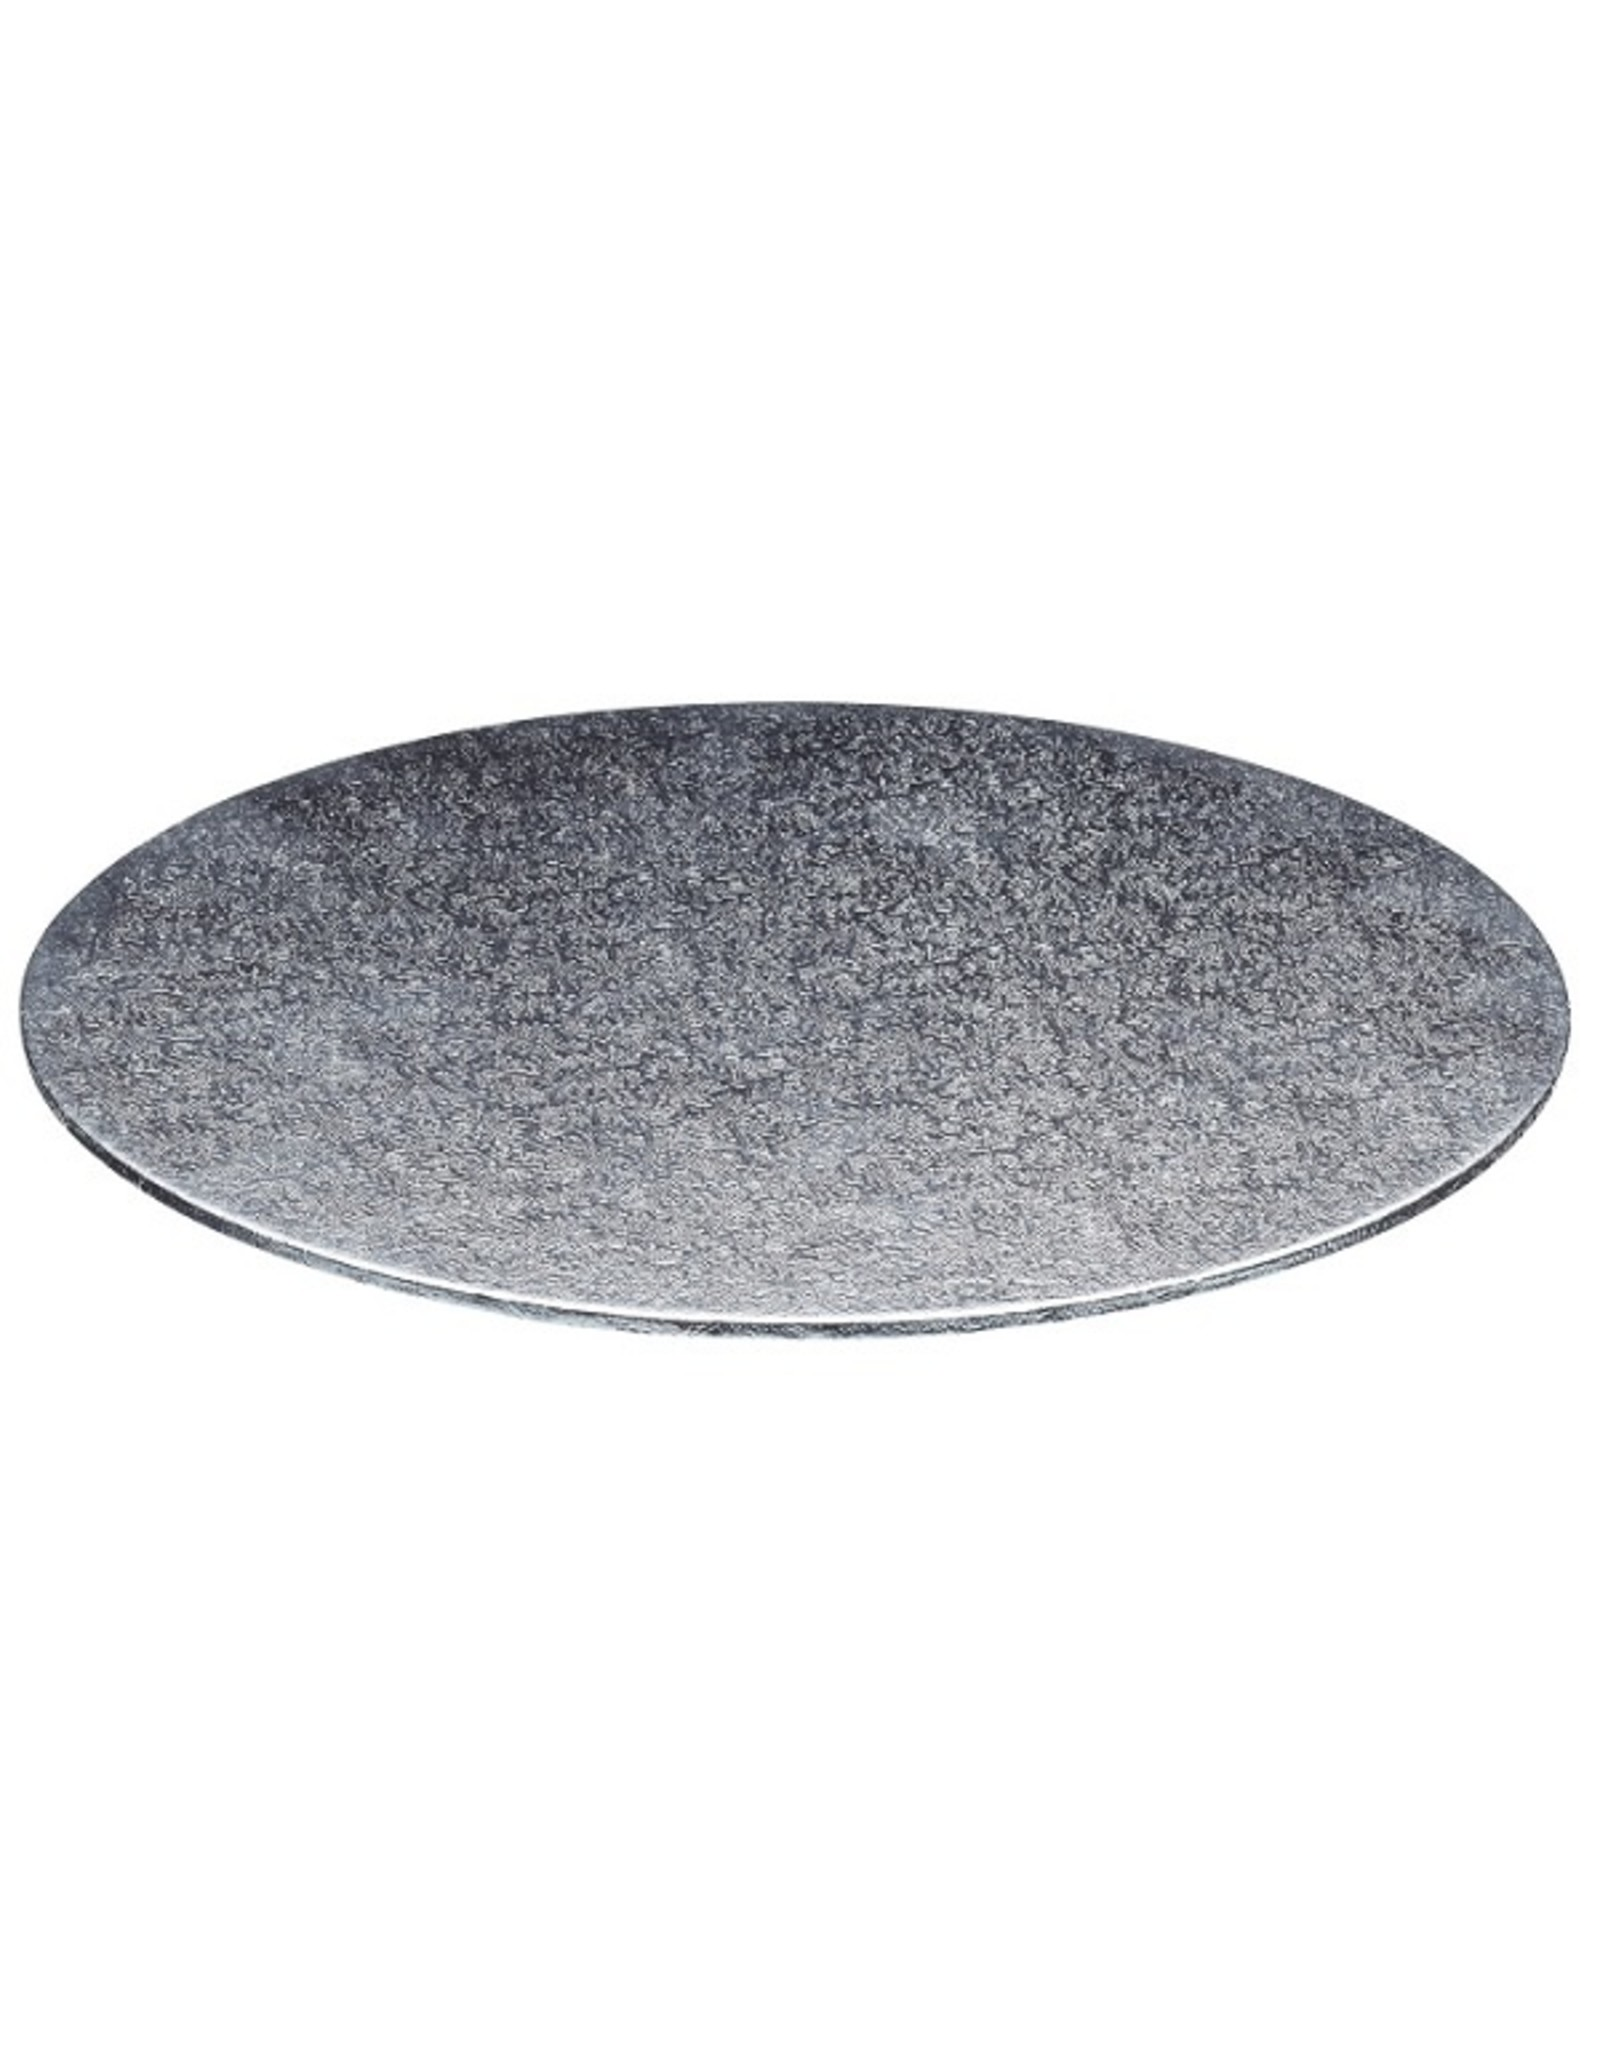 Cake boards Ø406 mm - silver (per 10 pieces)